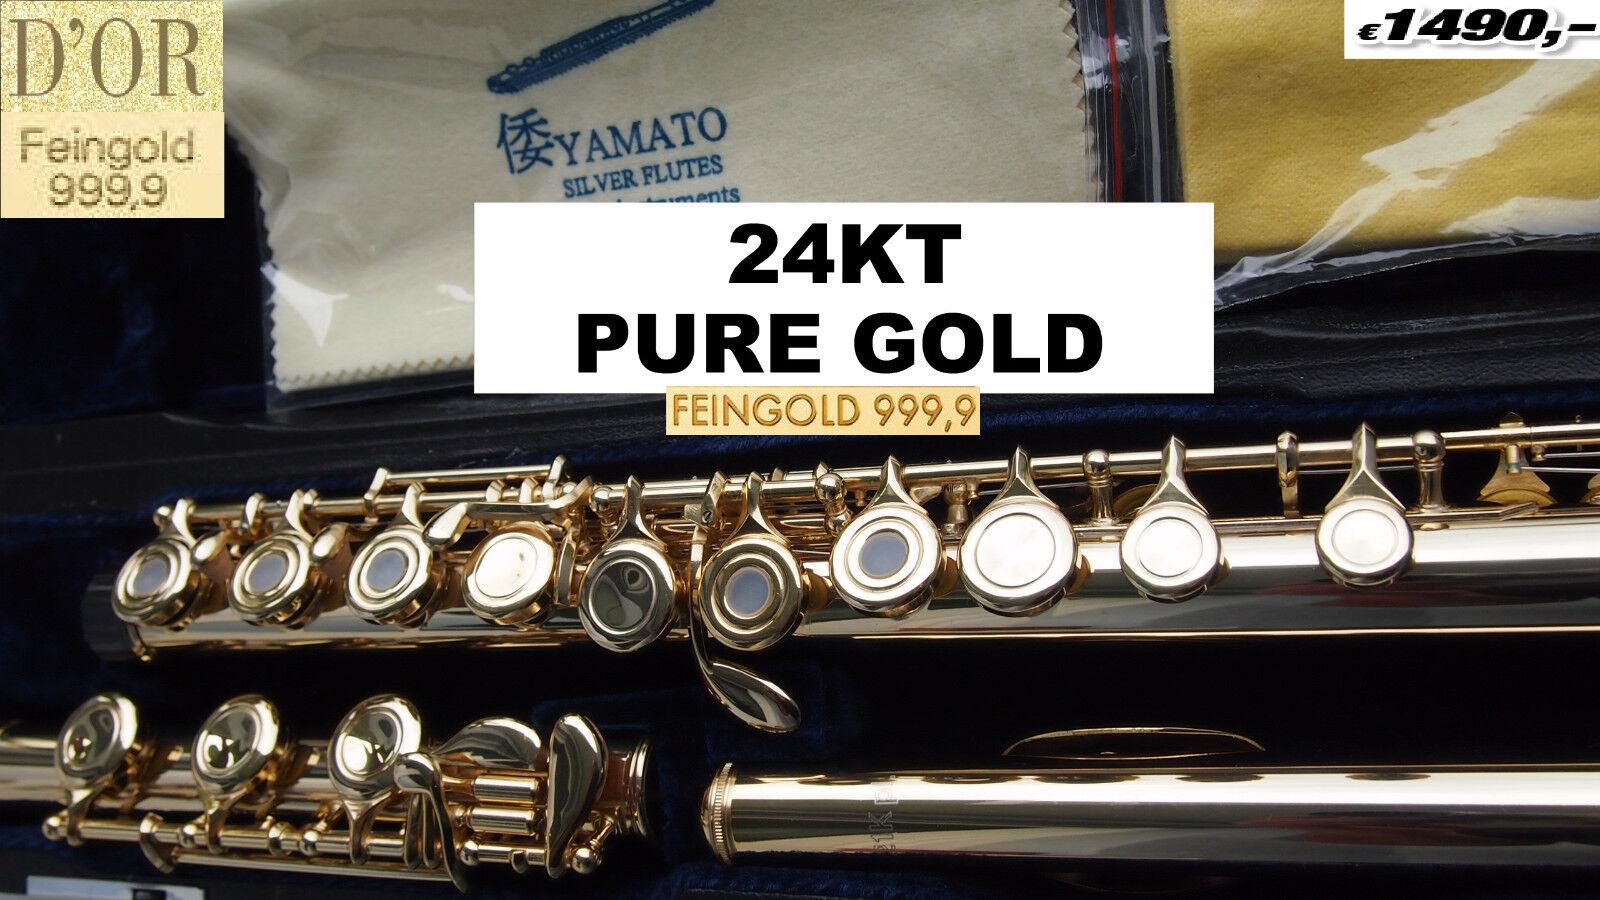 Querflöte Profi Gold 999 24 Kt Flute professionell 24kt Gelb gold ALLERGY FREE